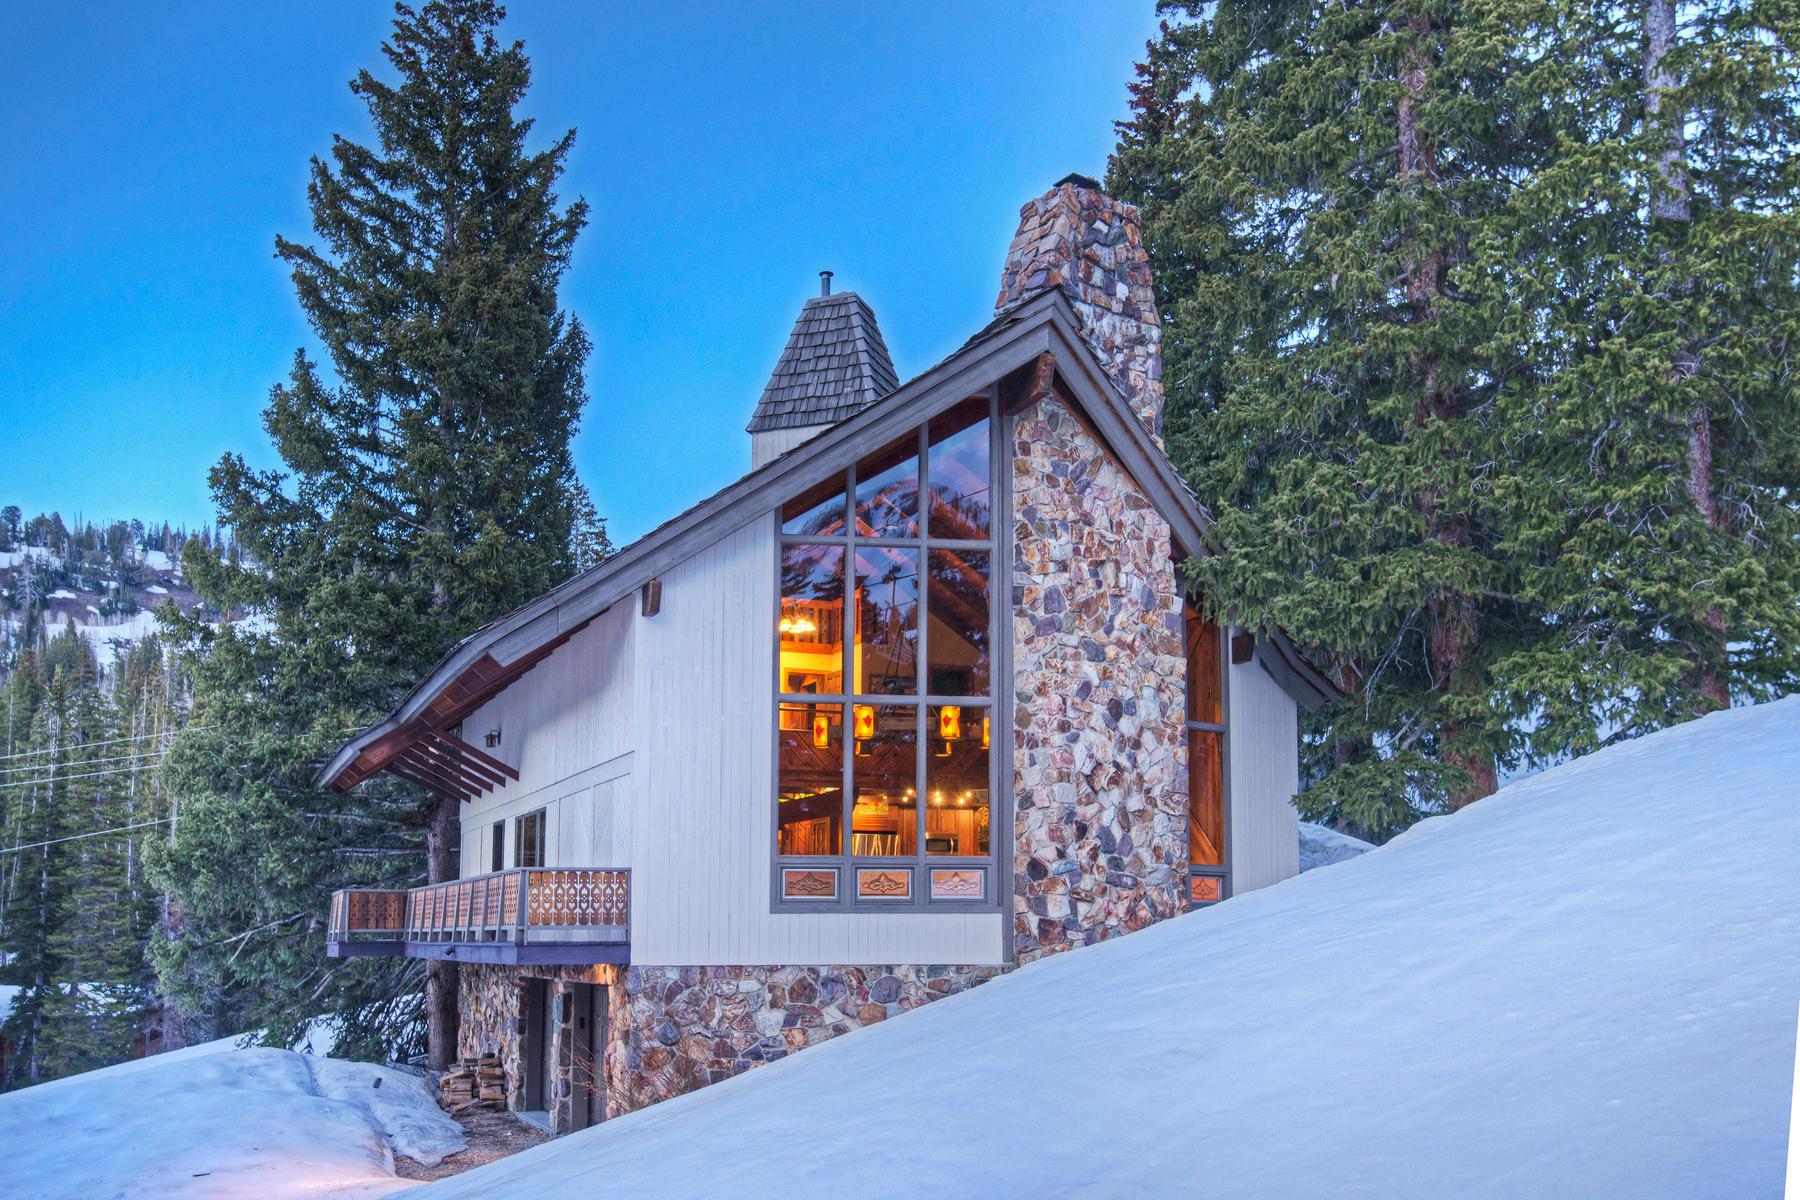 Moradia para Venda às Ski in /Ski out Mountain Luxury Cabin 8521 Snake Creek Rd Brighton, Utah, 84121 Estados Unidos